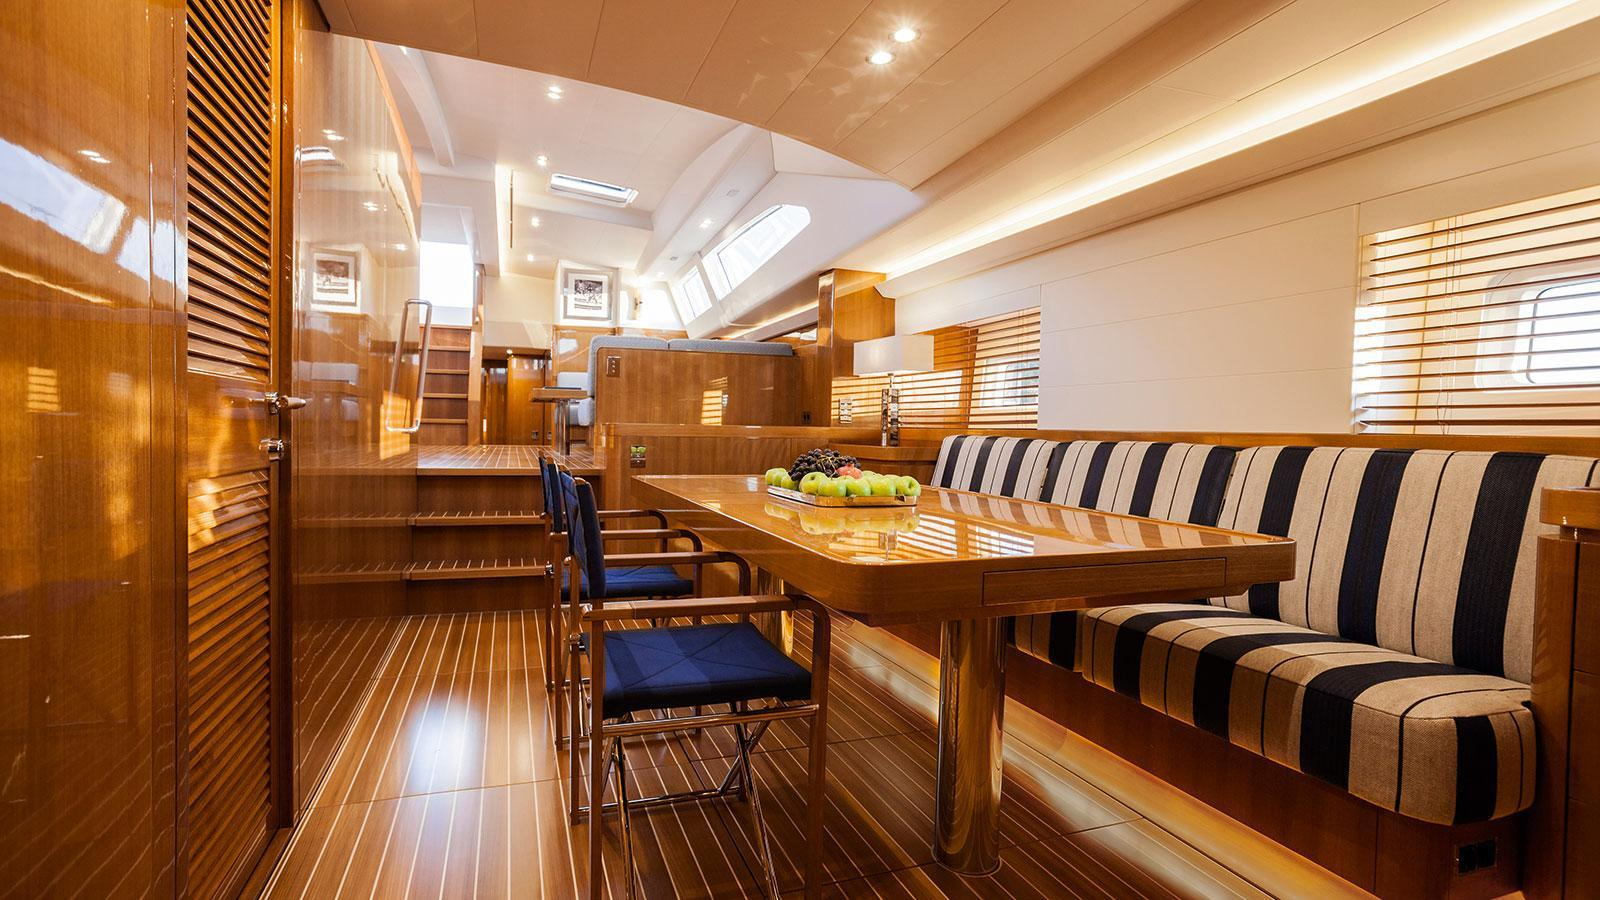 solleone-motor-yacht-nautors-swan-115-s-2015-35m-dining-room